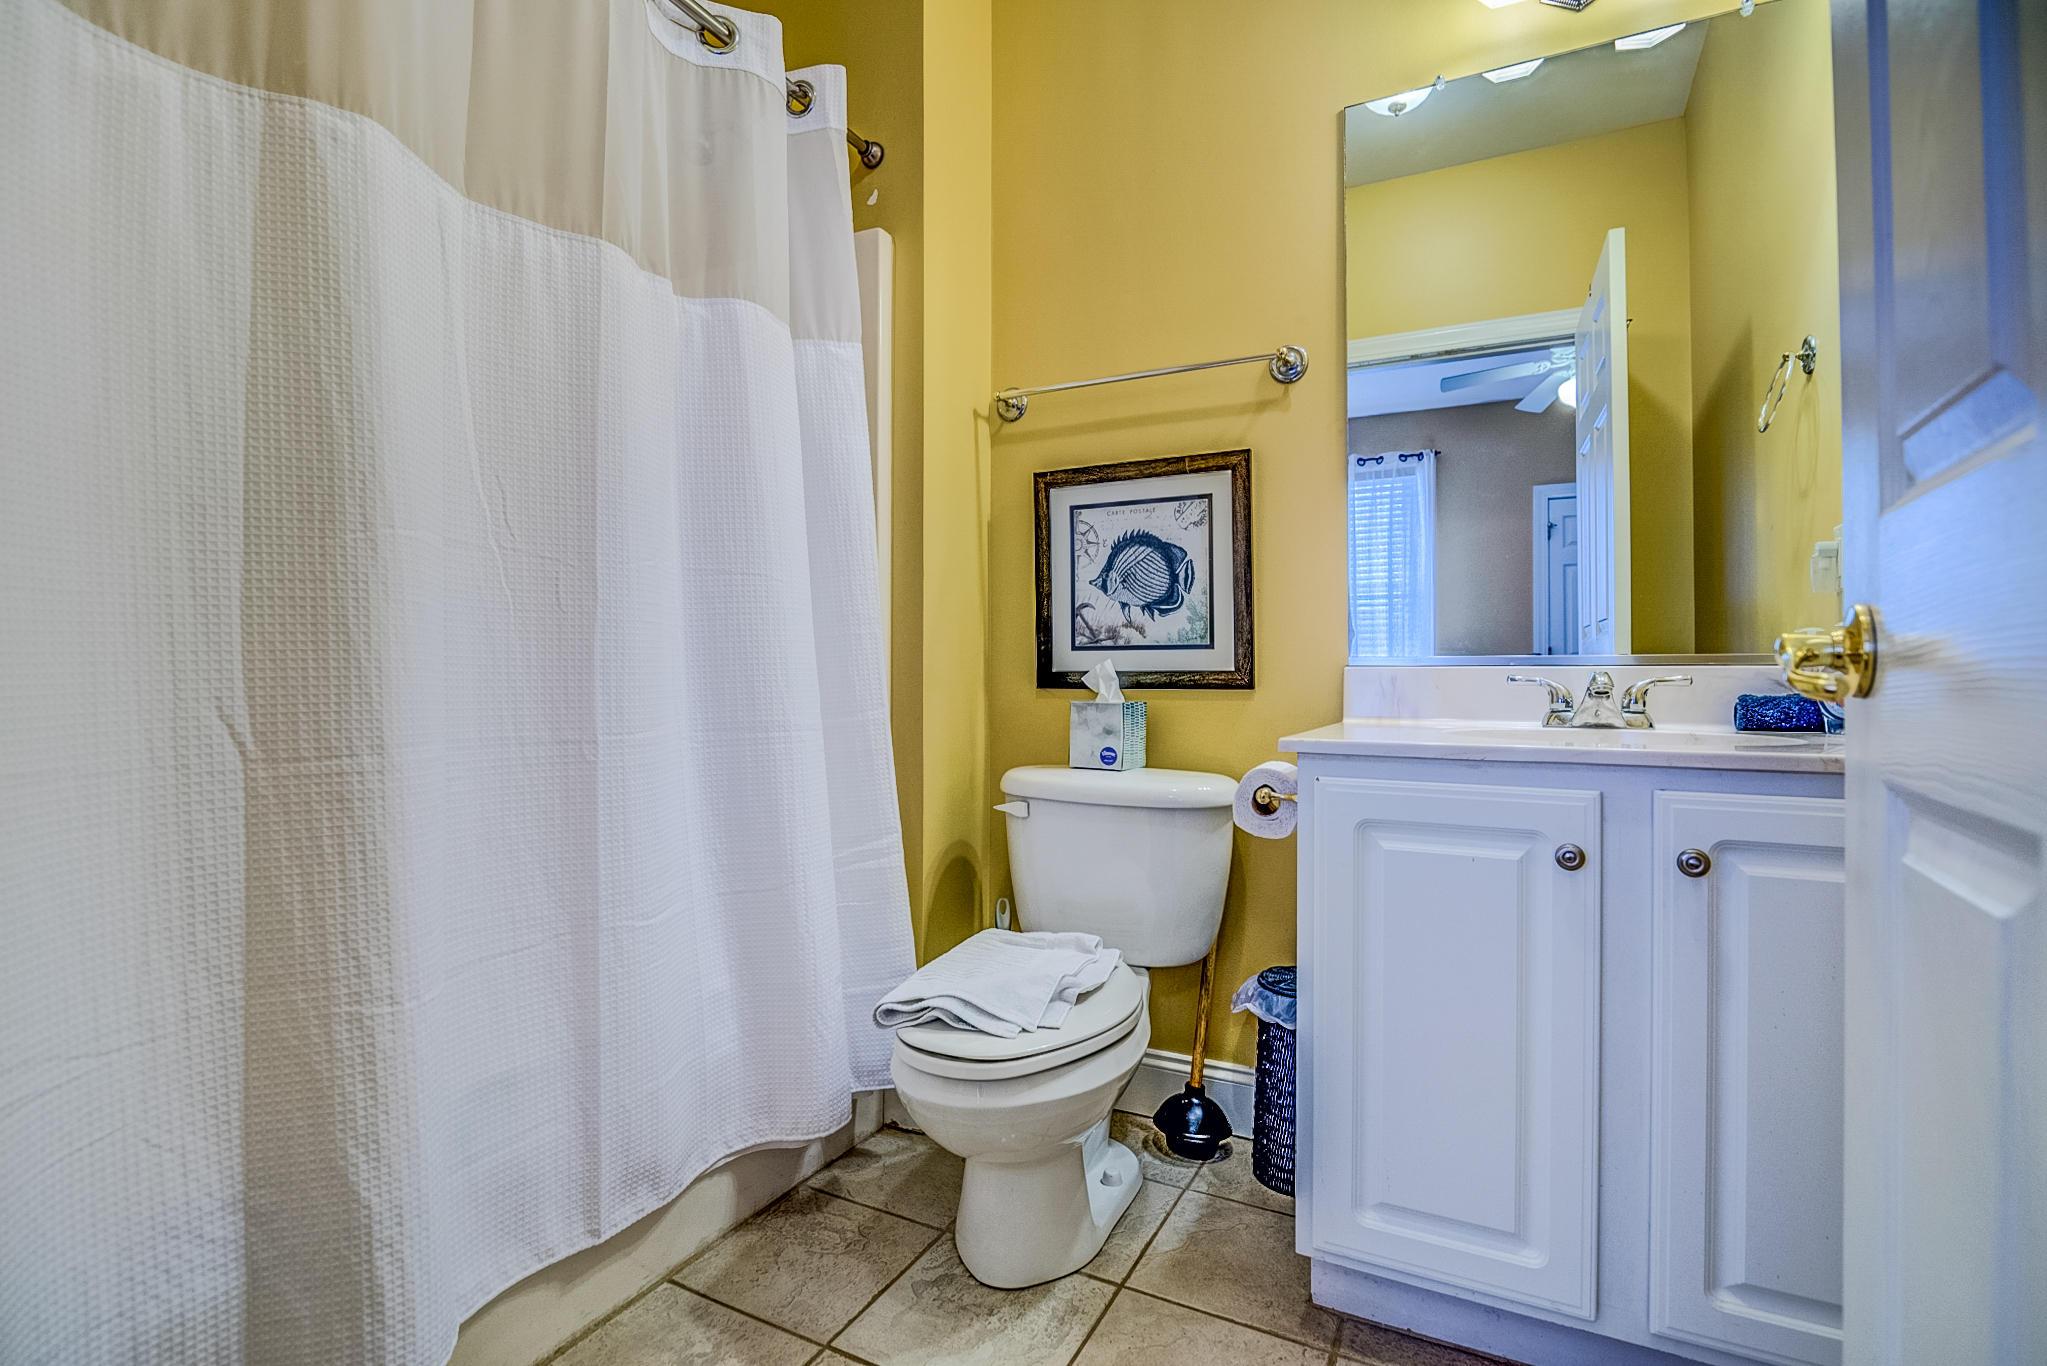 Ocean Pointe Villas Homes For Sale - 214 Arctic, Folly Beach, SC - 22